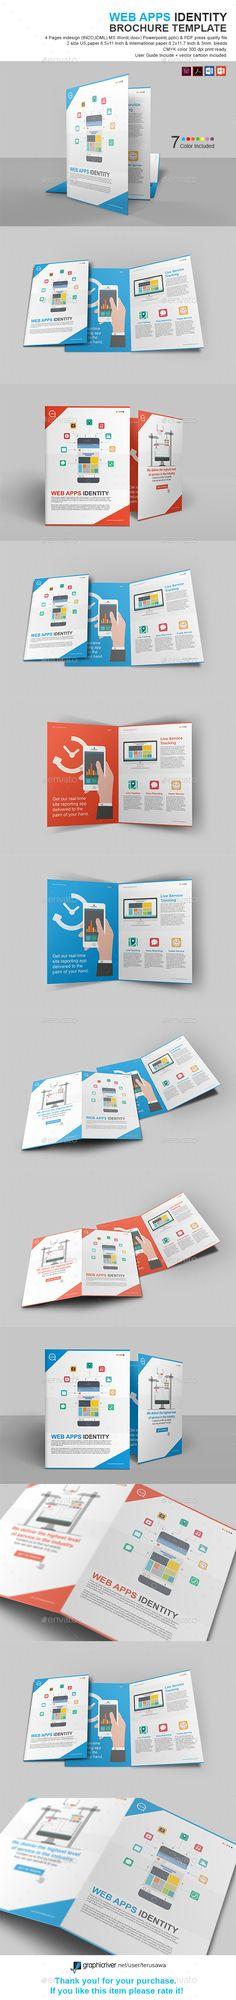 mobile app trifold brochure template design download http